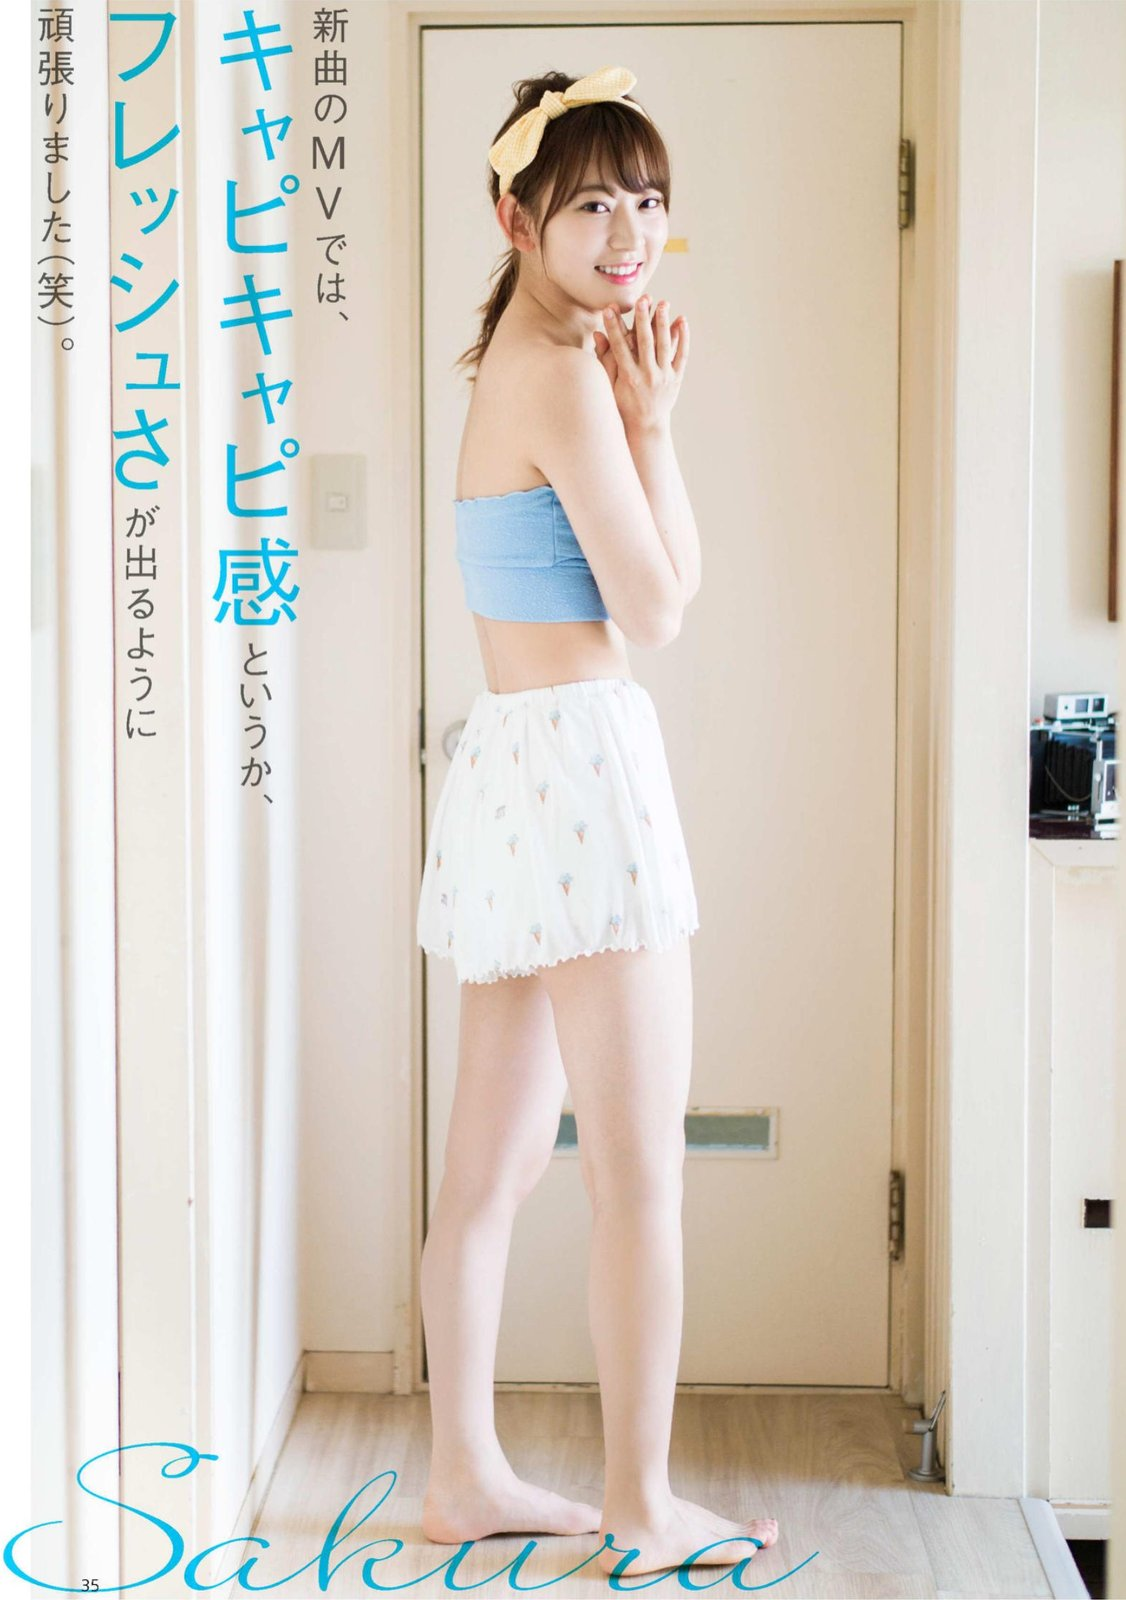 Miyawaki Sakura 宮脇咲良, Tokyo Walker+ 2017 Vol.32 (東京ウォーカー 2017年32号)